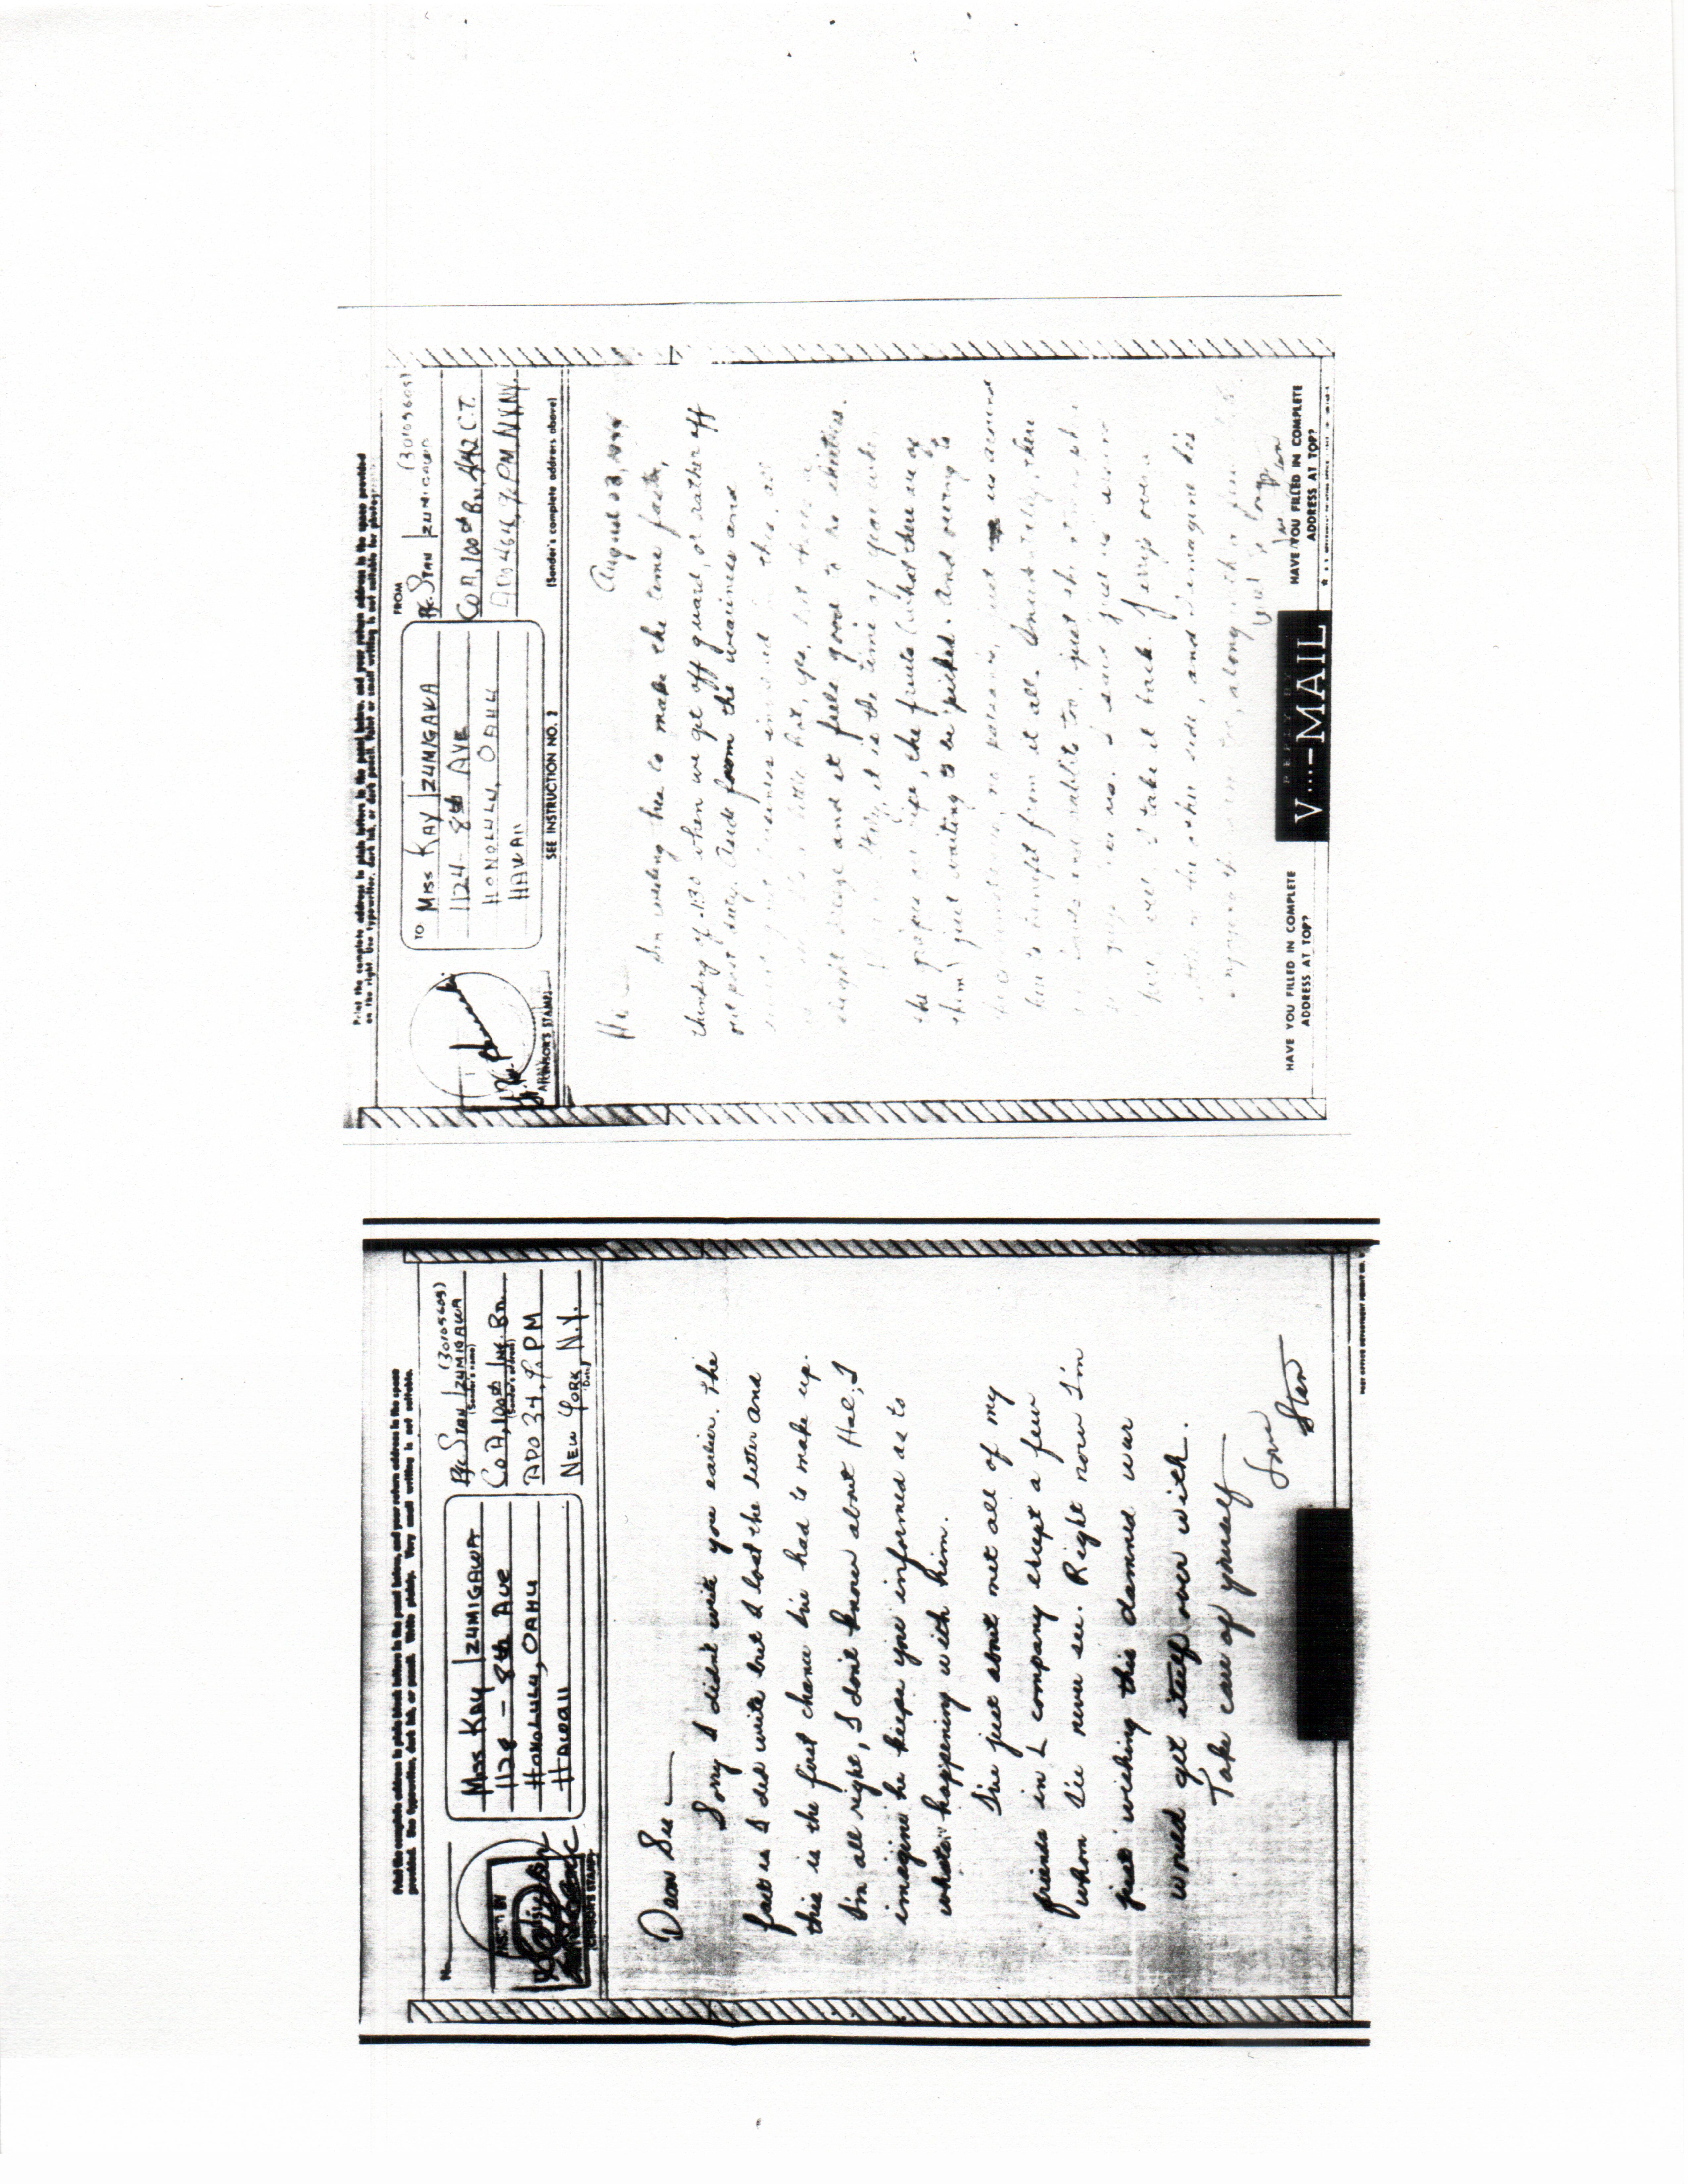 Stanley Izumigawa Letters 1944